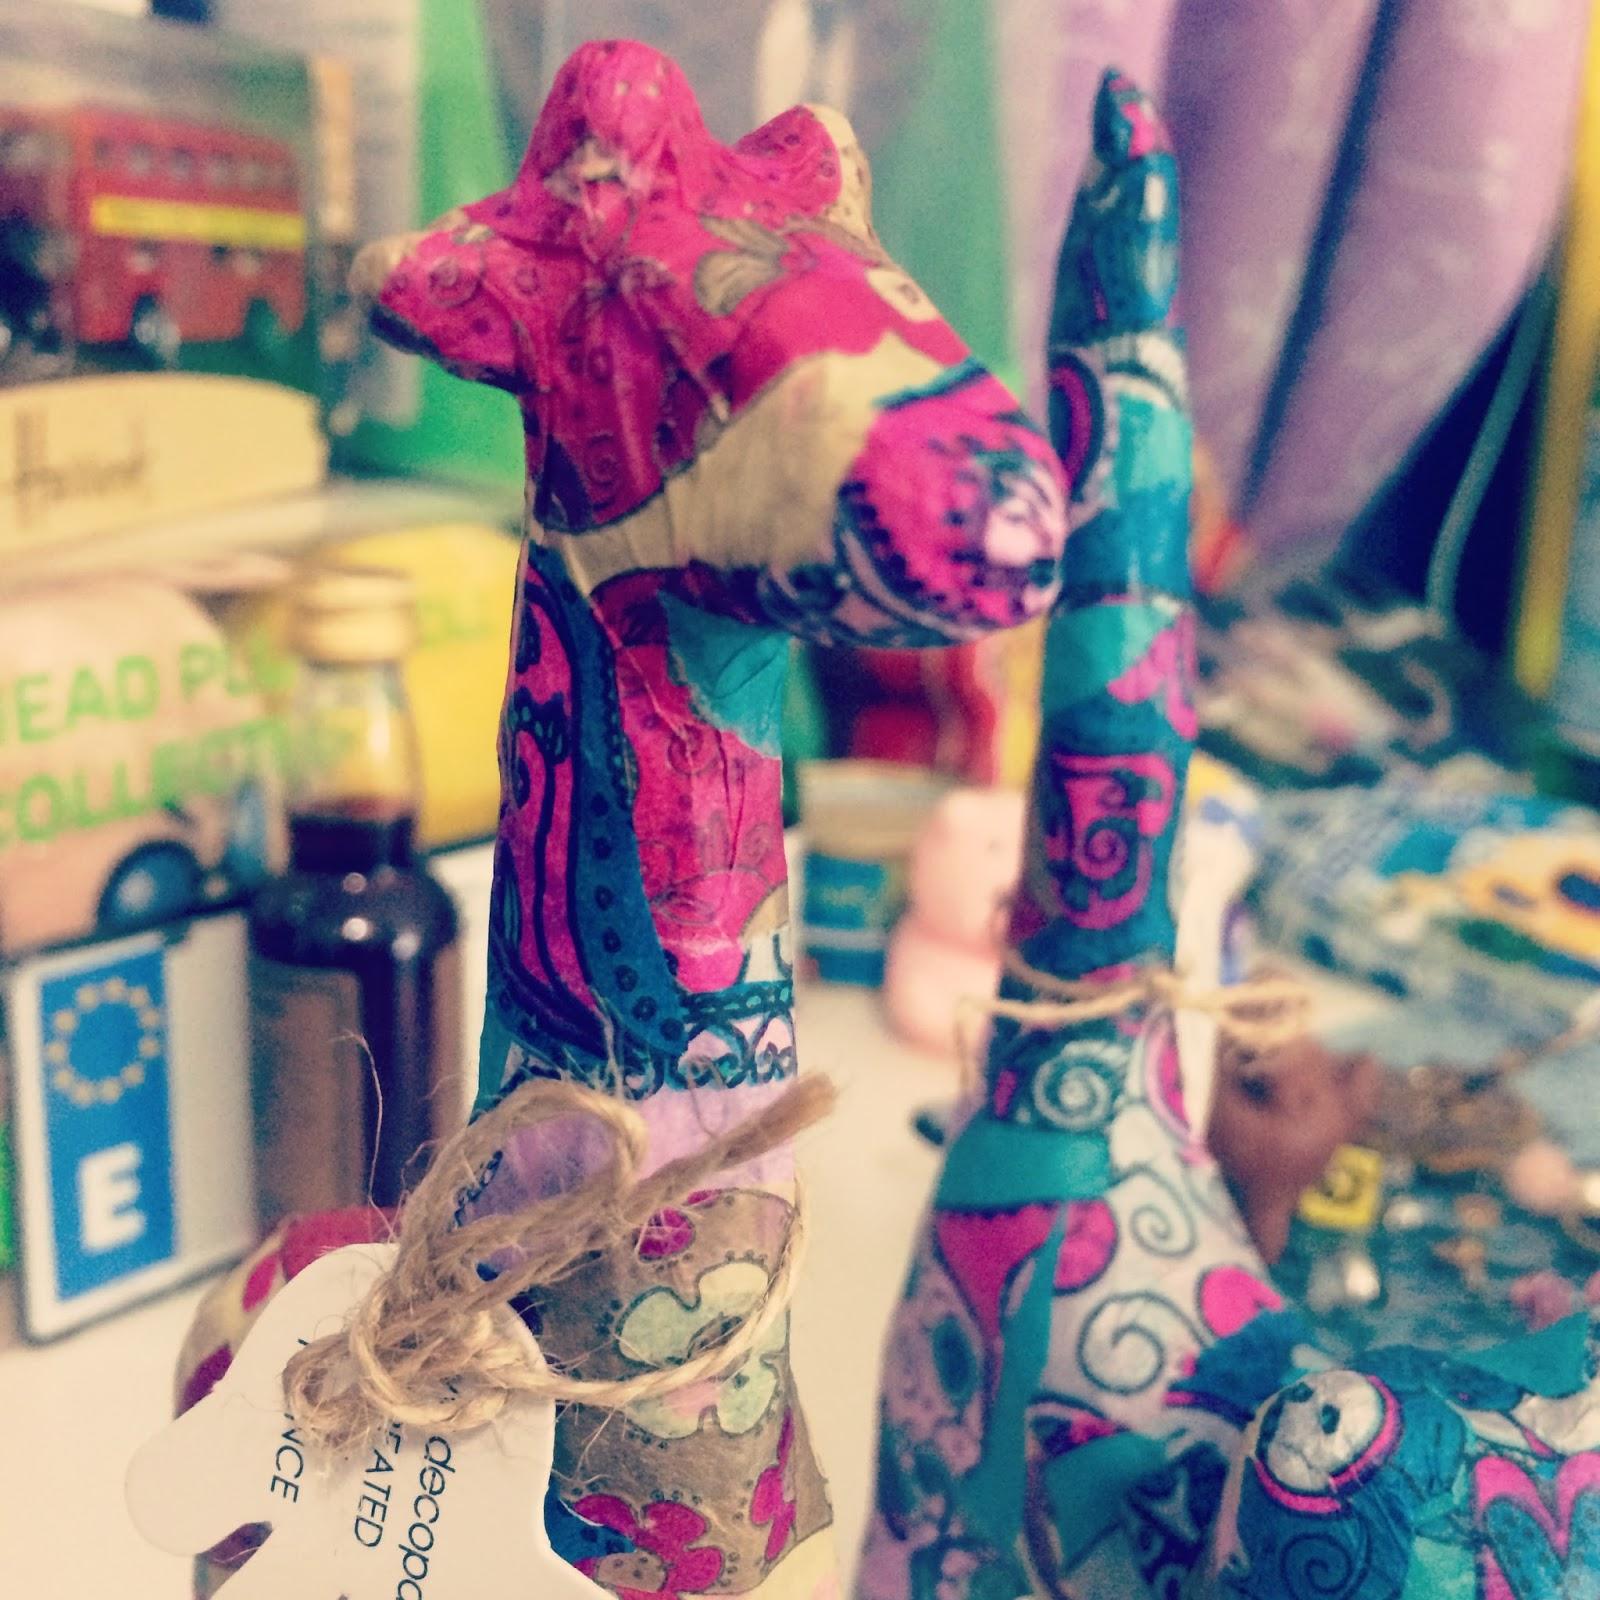 Decopatch 蝶古巴特~拼貼的藝術,也可以很時尚可愛!☺Jennifer養雞雞美學任務